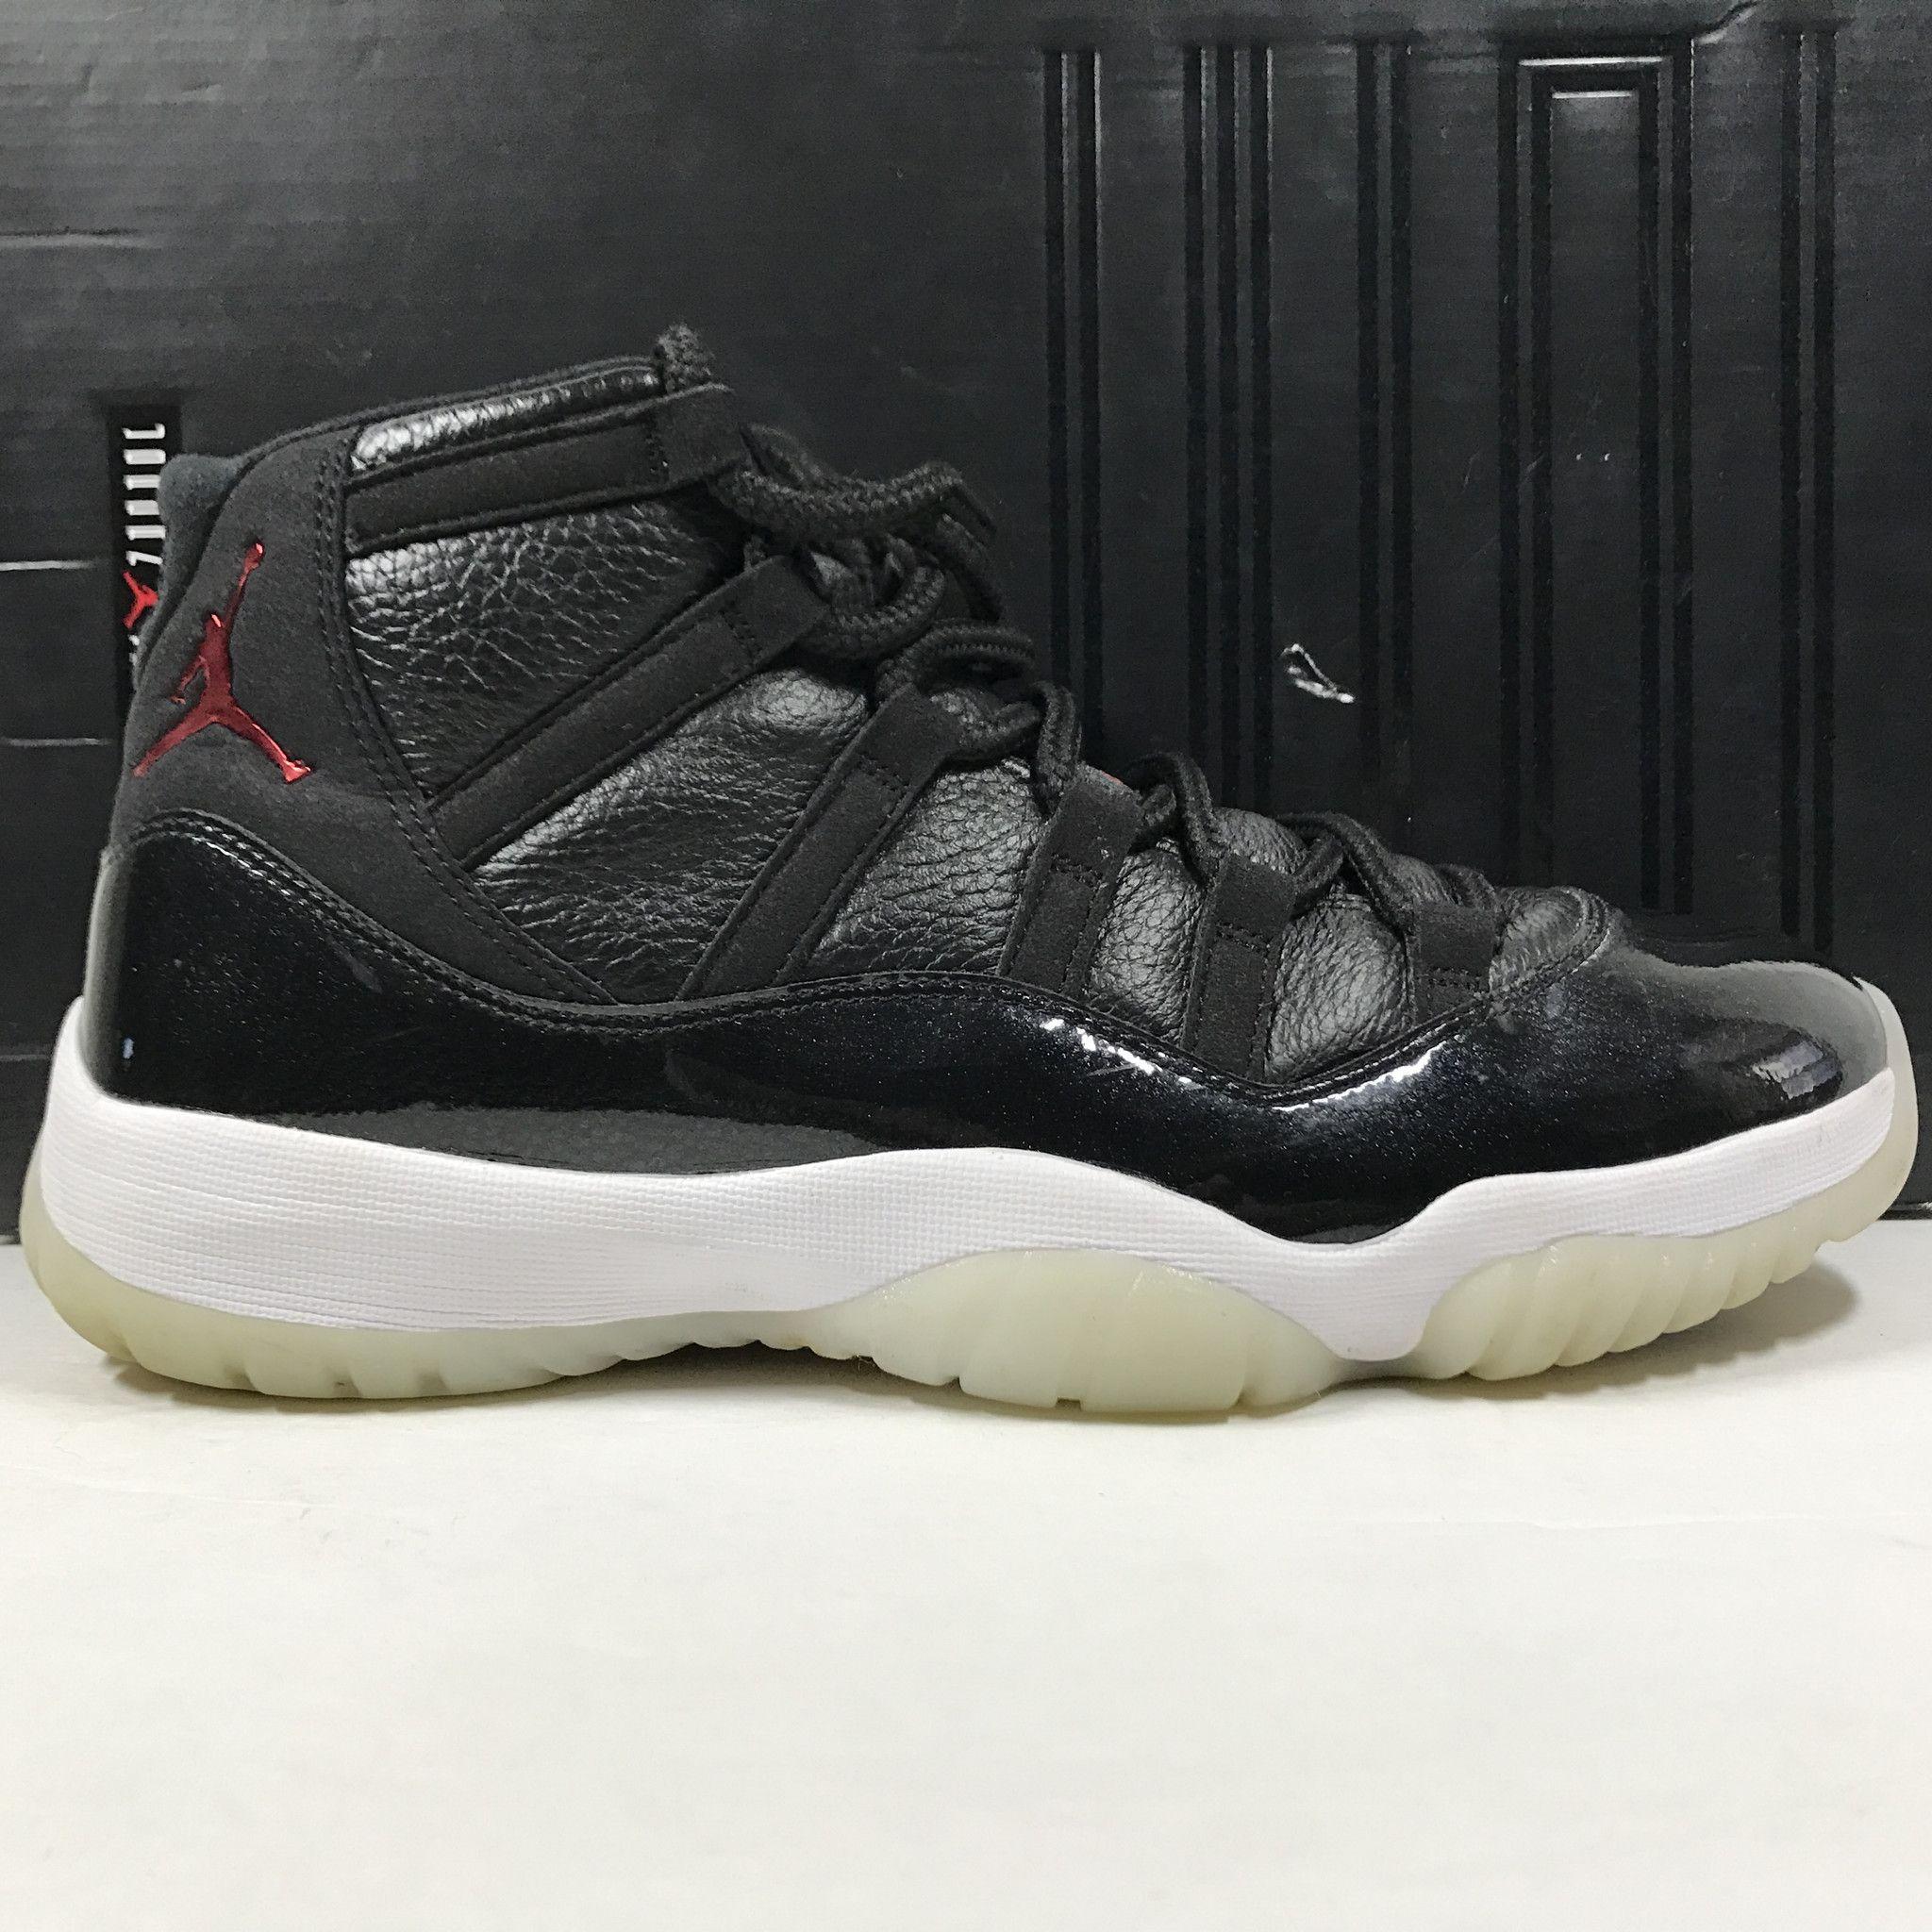 purchase cheap 4447a 33440 Nike Air Jordan 11 XI Retro 72-10 Size 9